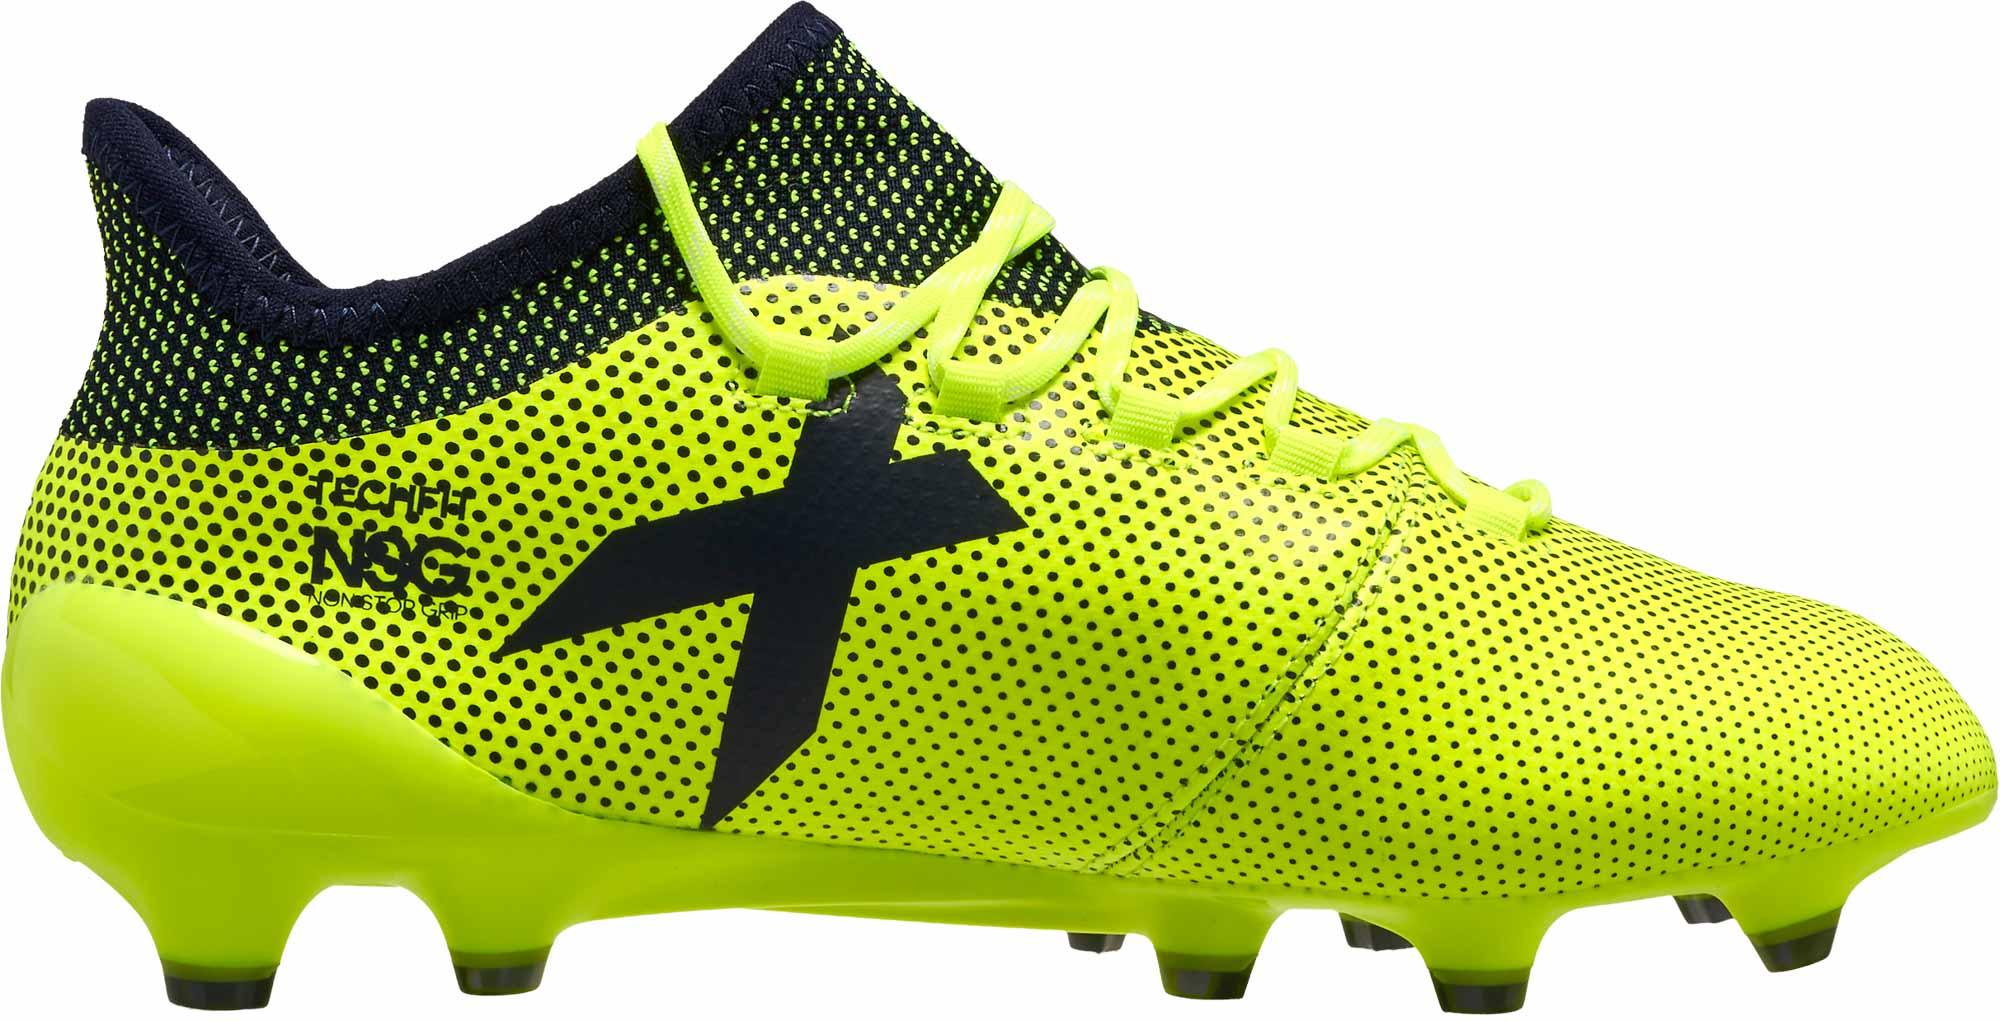 adidas X 17.1 FG Soccer Cleats - Solar Yellow   Legend Ink - Soccer ... 368ae5f8a692